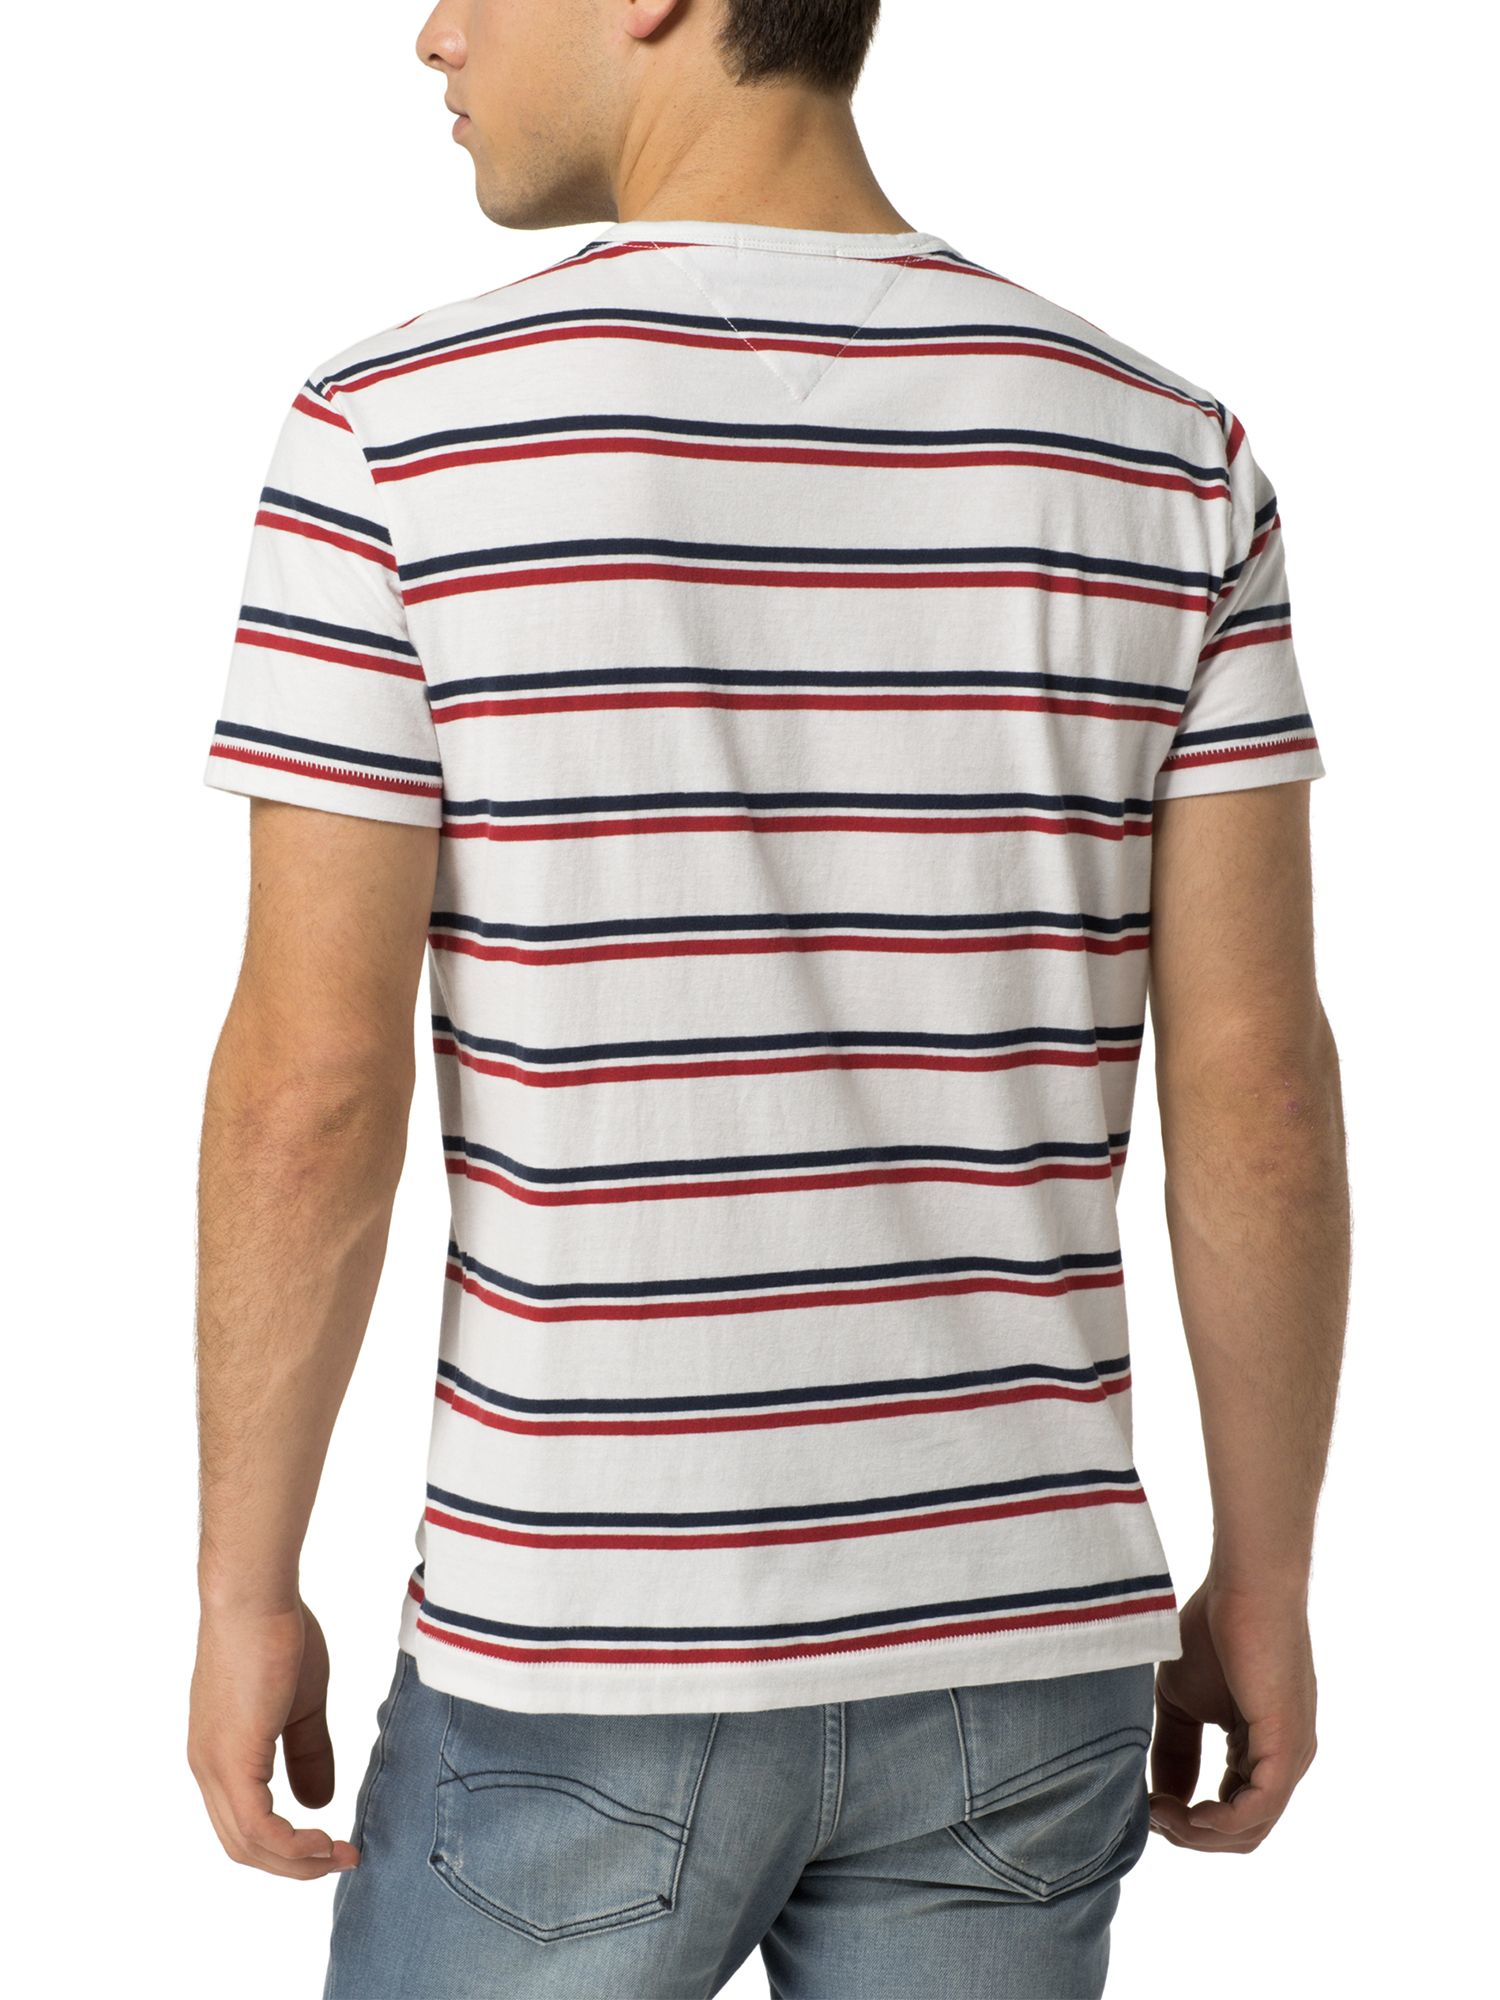 Tommy hilfiger stripe t shirt in white for men lyst for Tommy hilfiger fitzgerald striped shirt